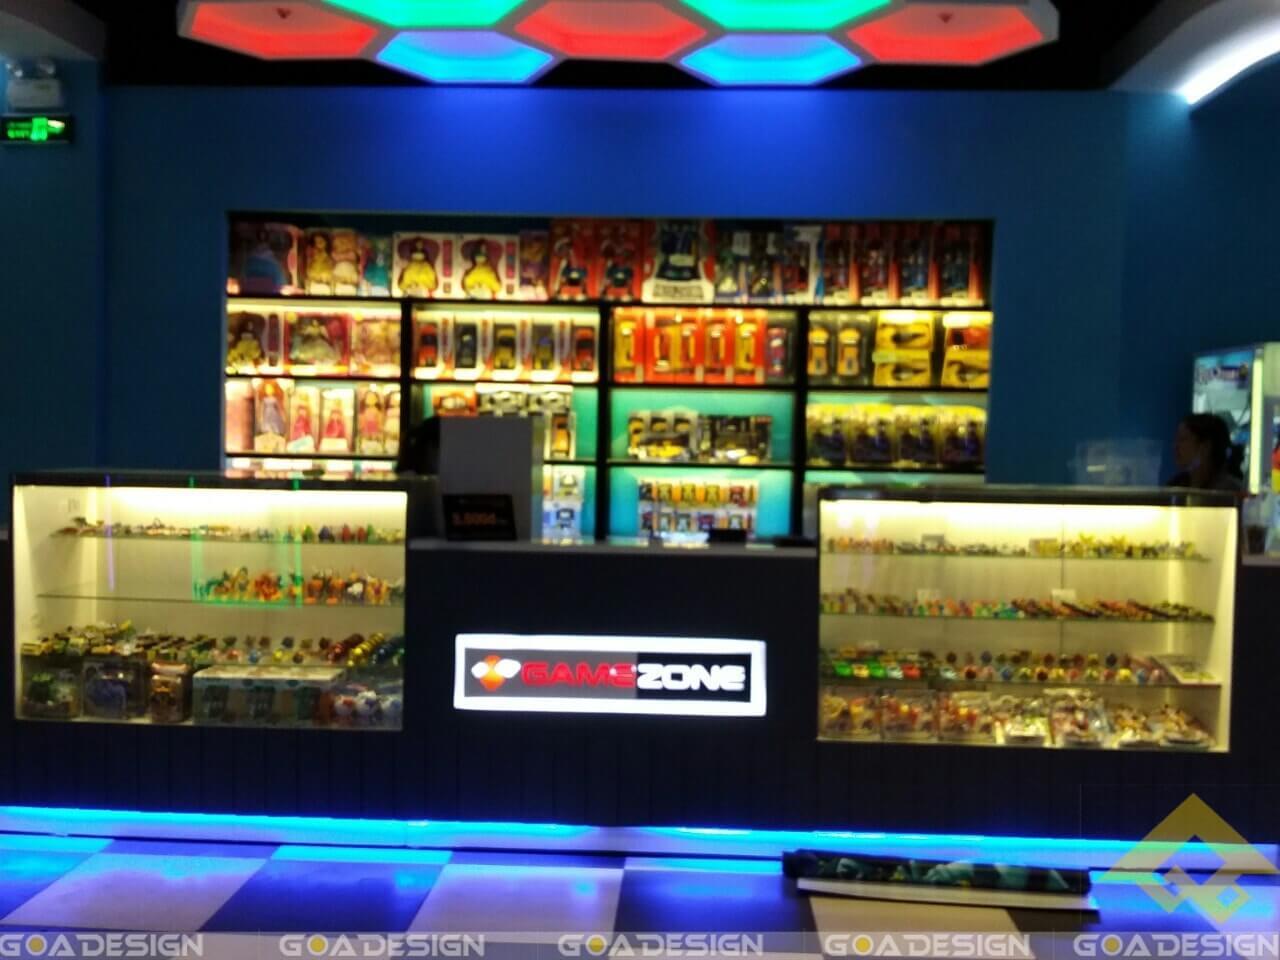 GOADESIGN Thiết kế khu vui chơi Lotte Mart - Q7 (3)